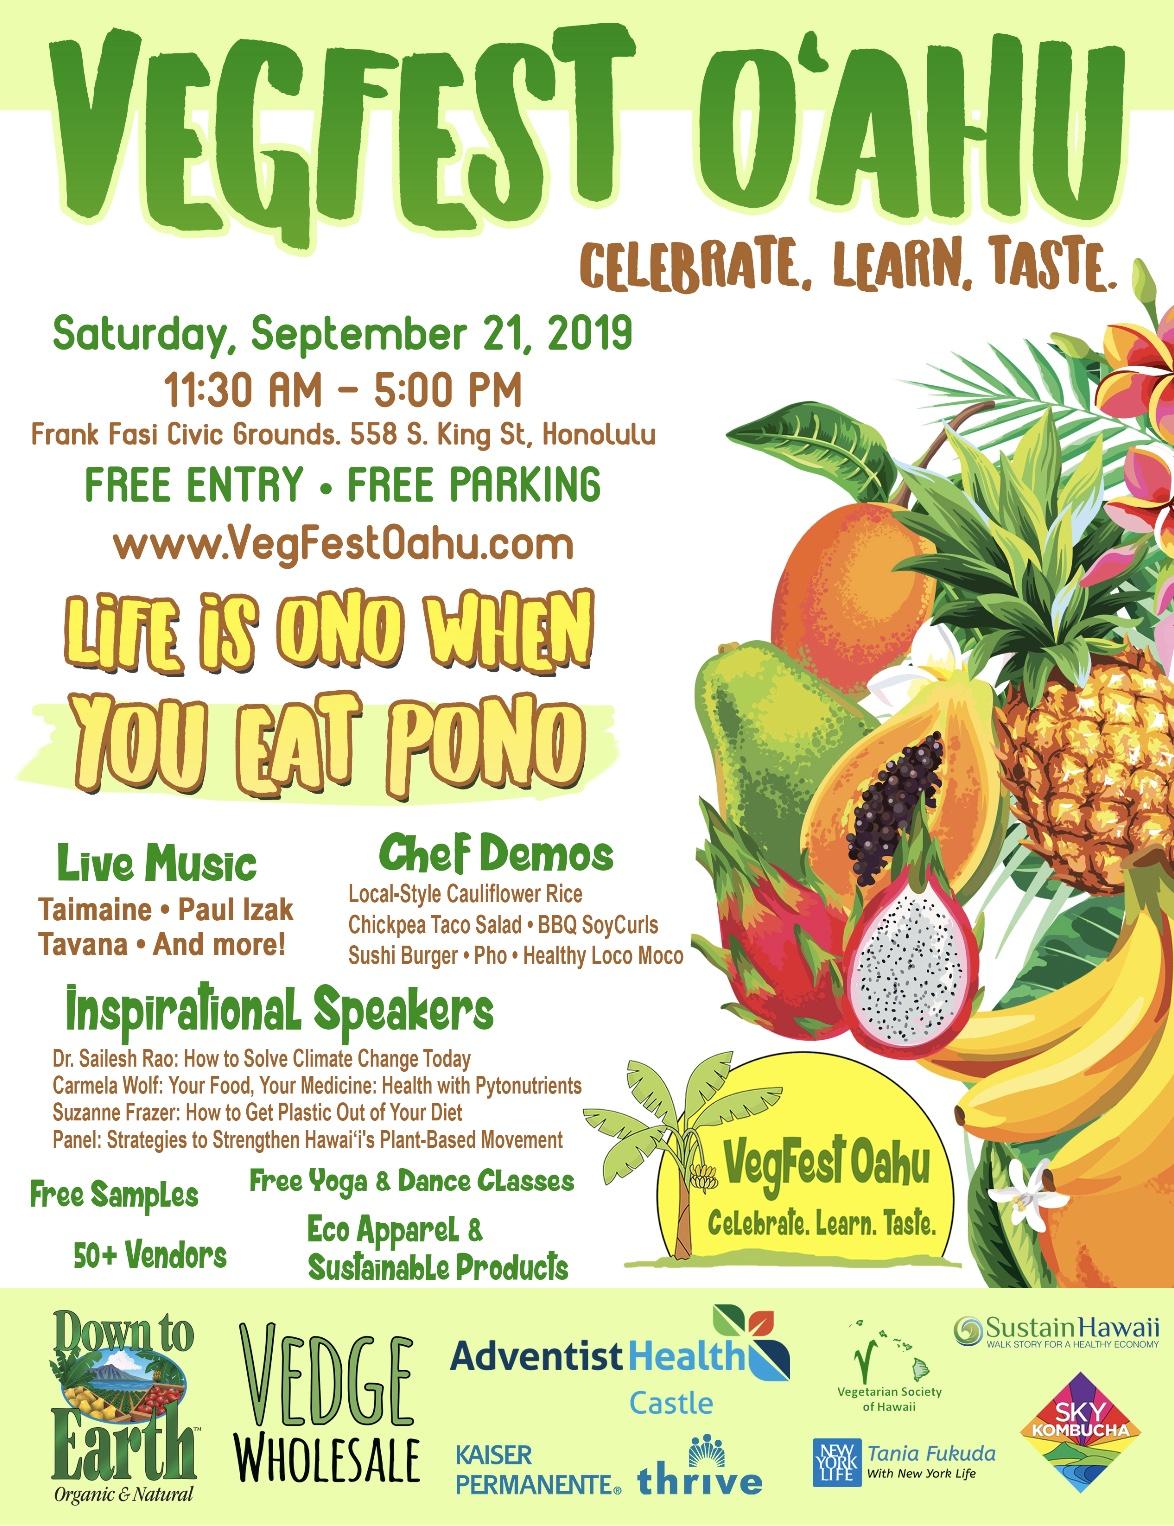 Poster for VegFest Oahu 2019 on Sept 21